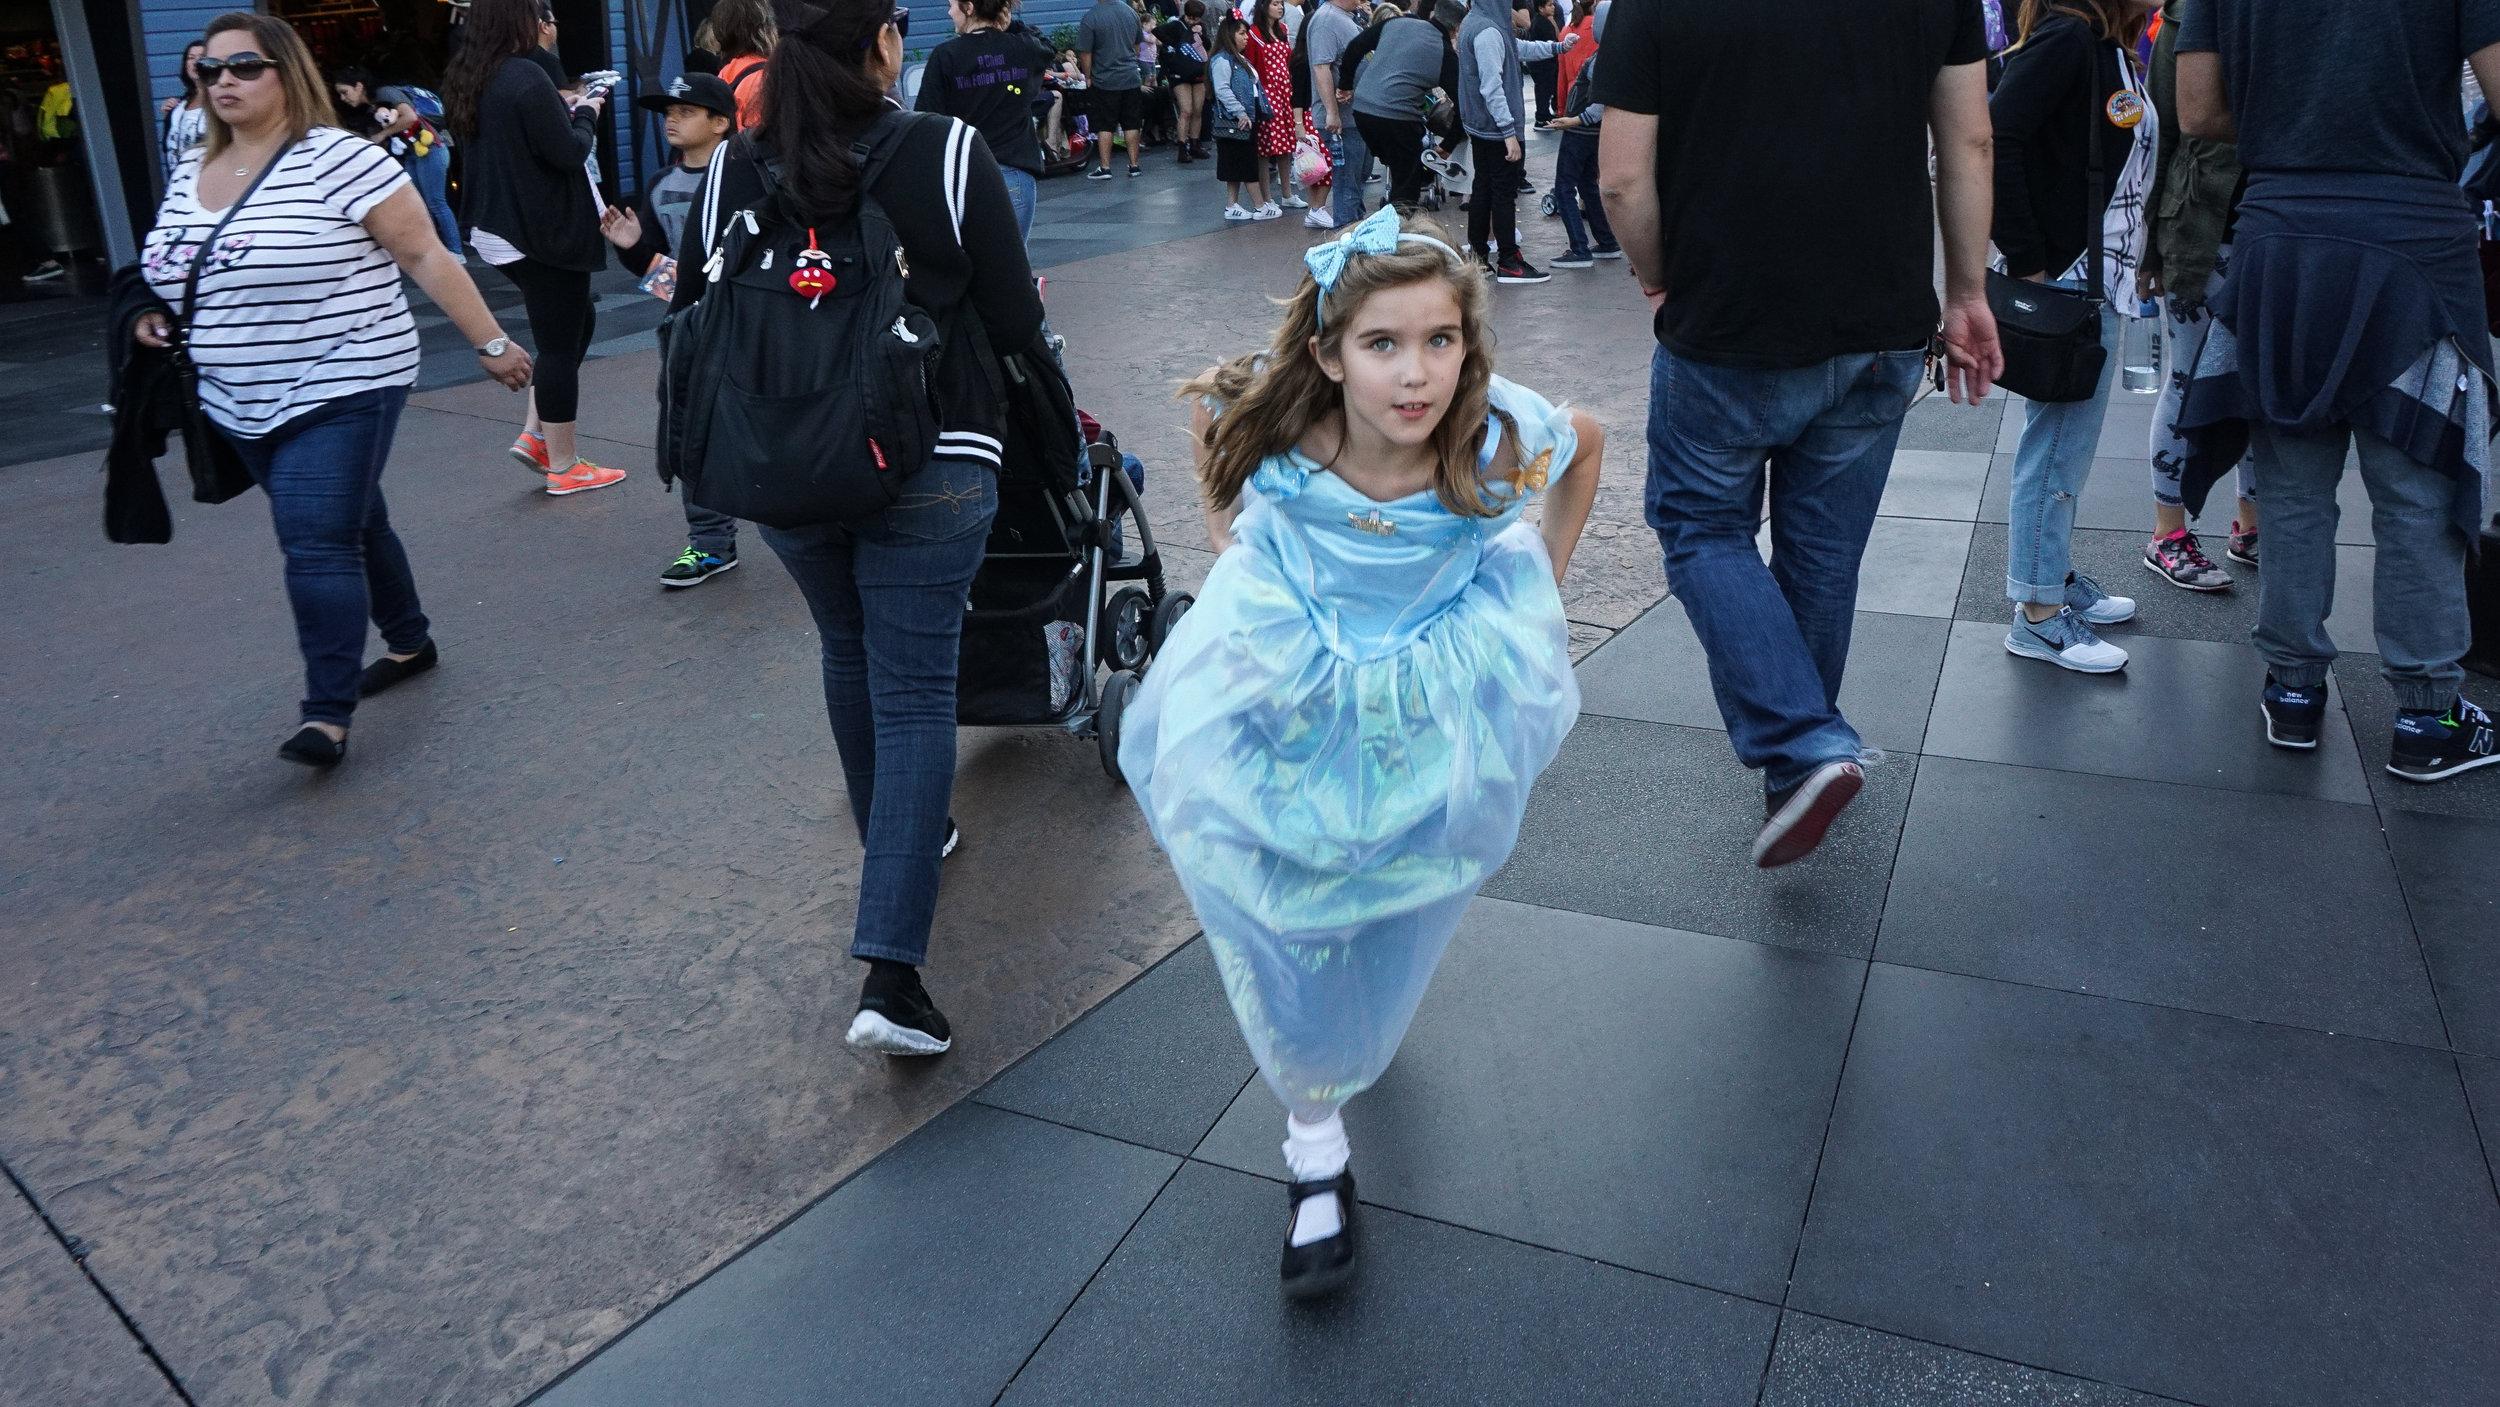 Disney-Blue-princess-1-04567.jpg